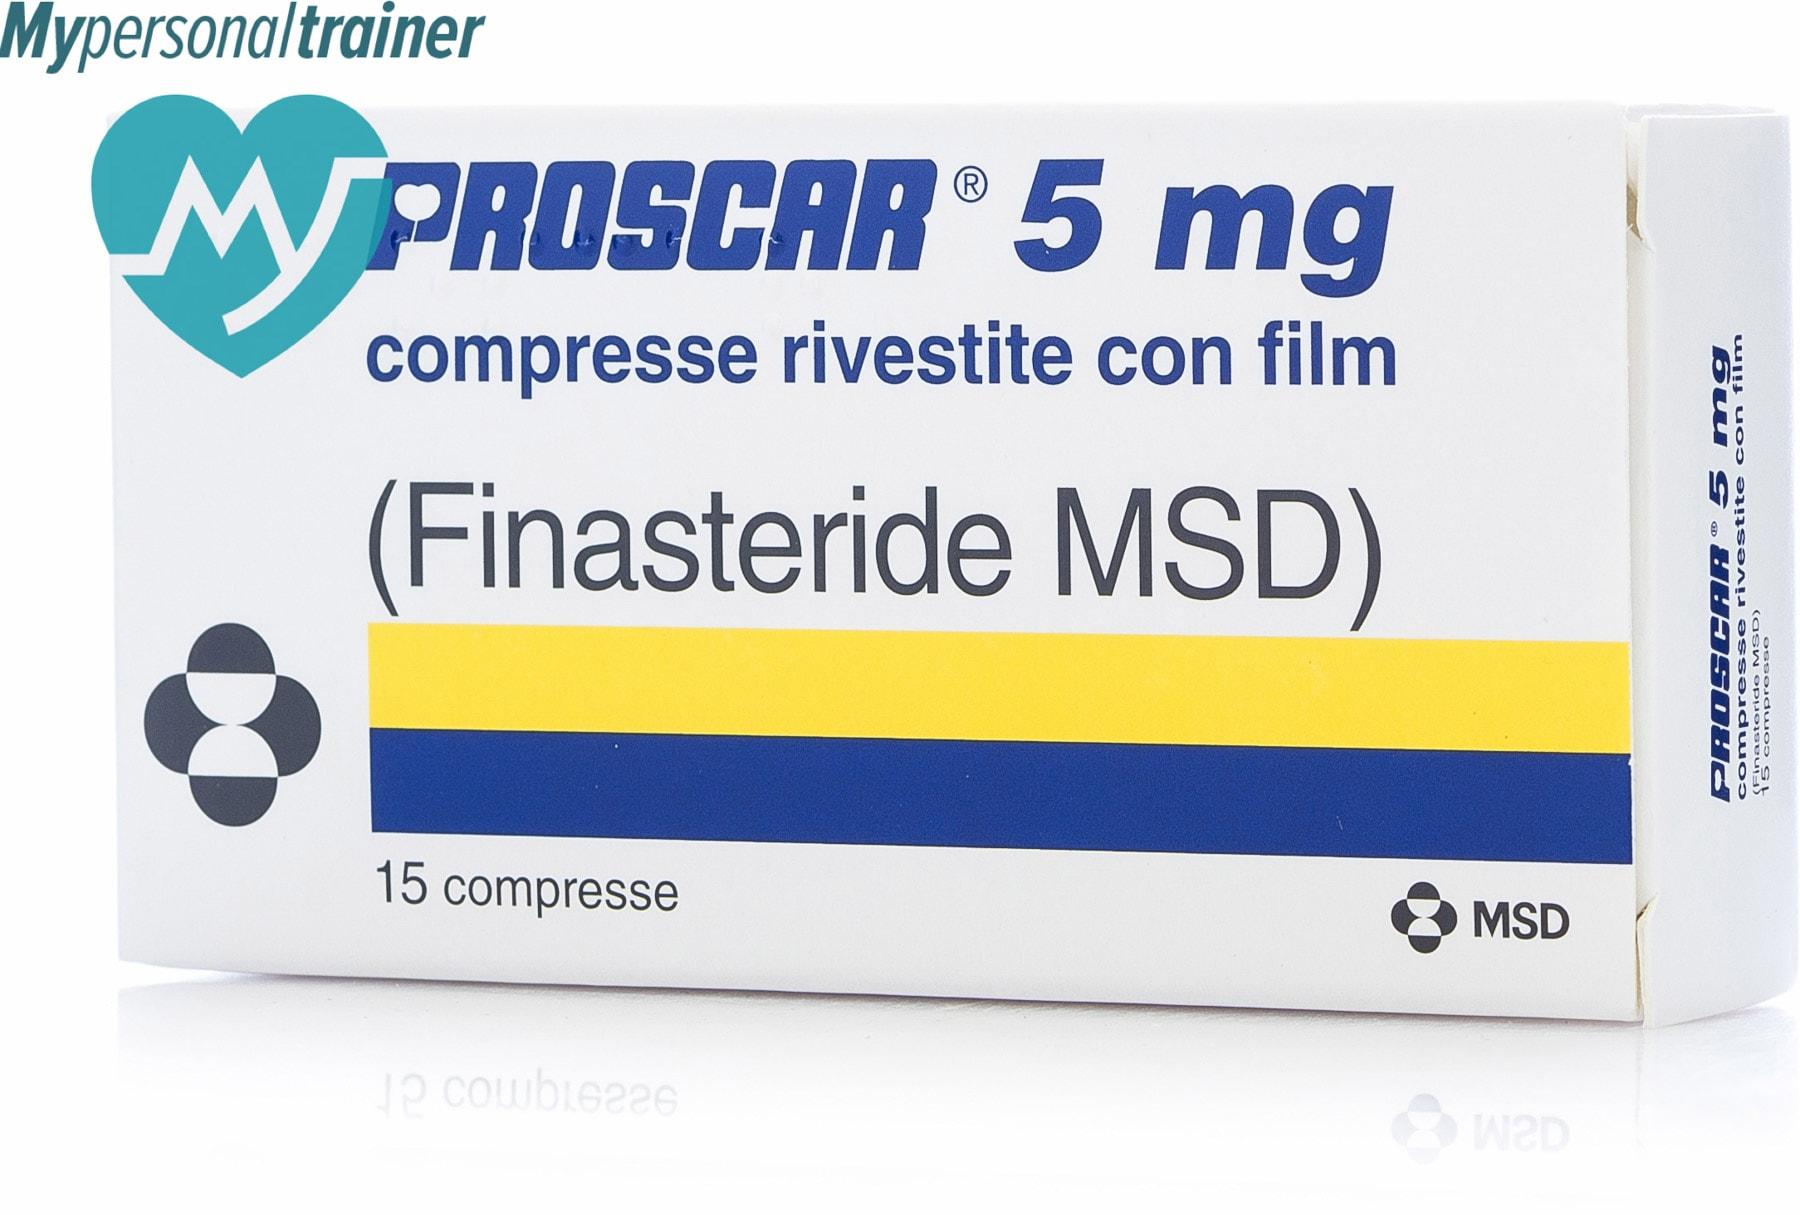 finasteride efficacia terapia prostatite